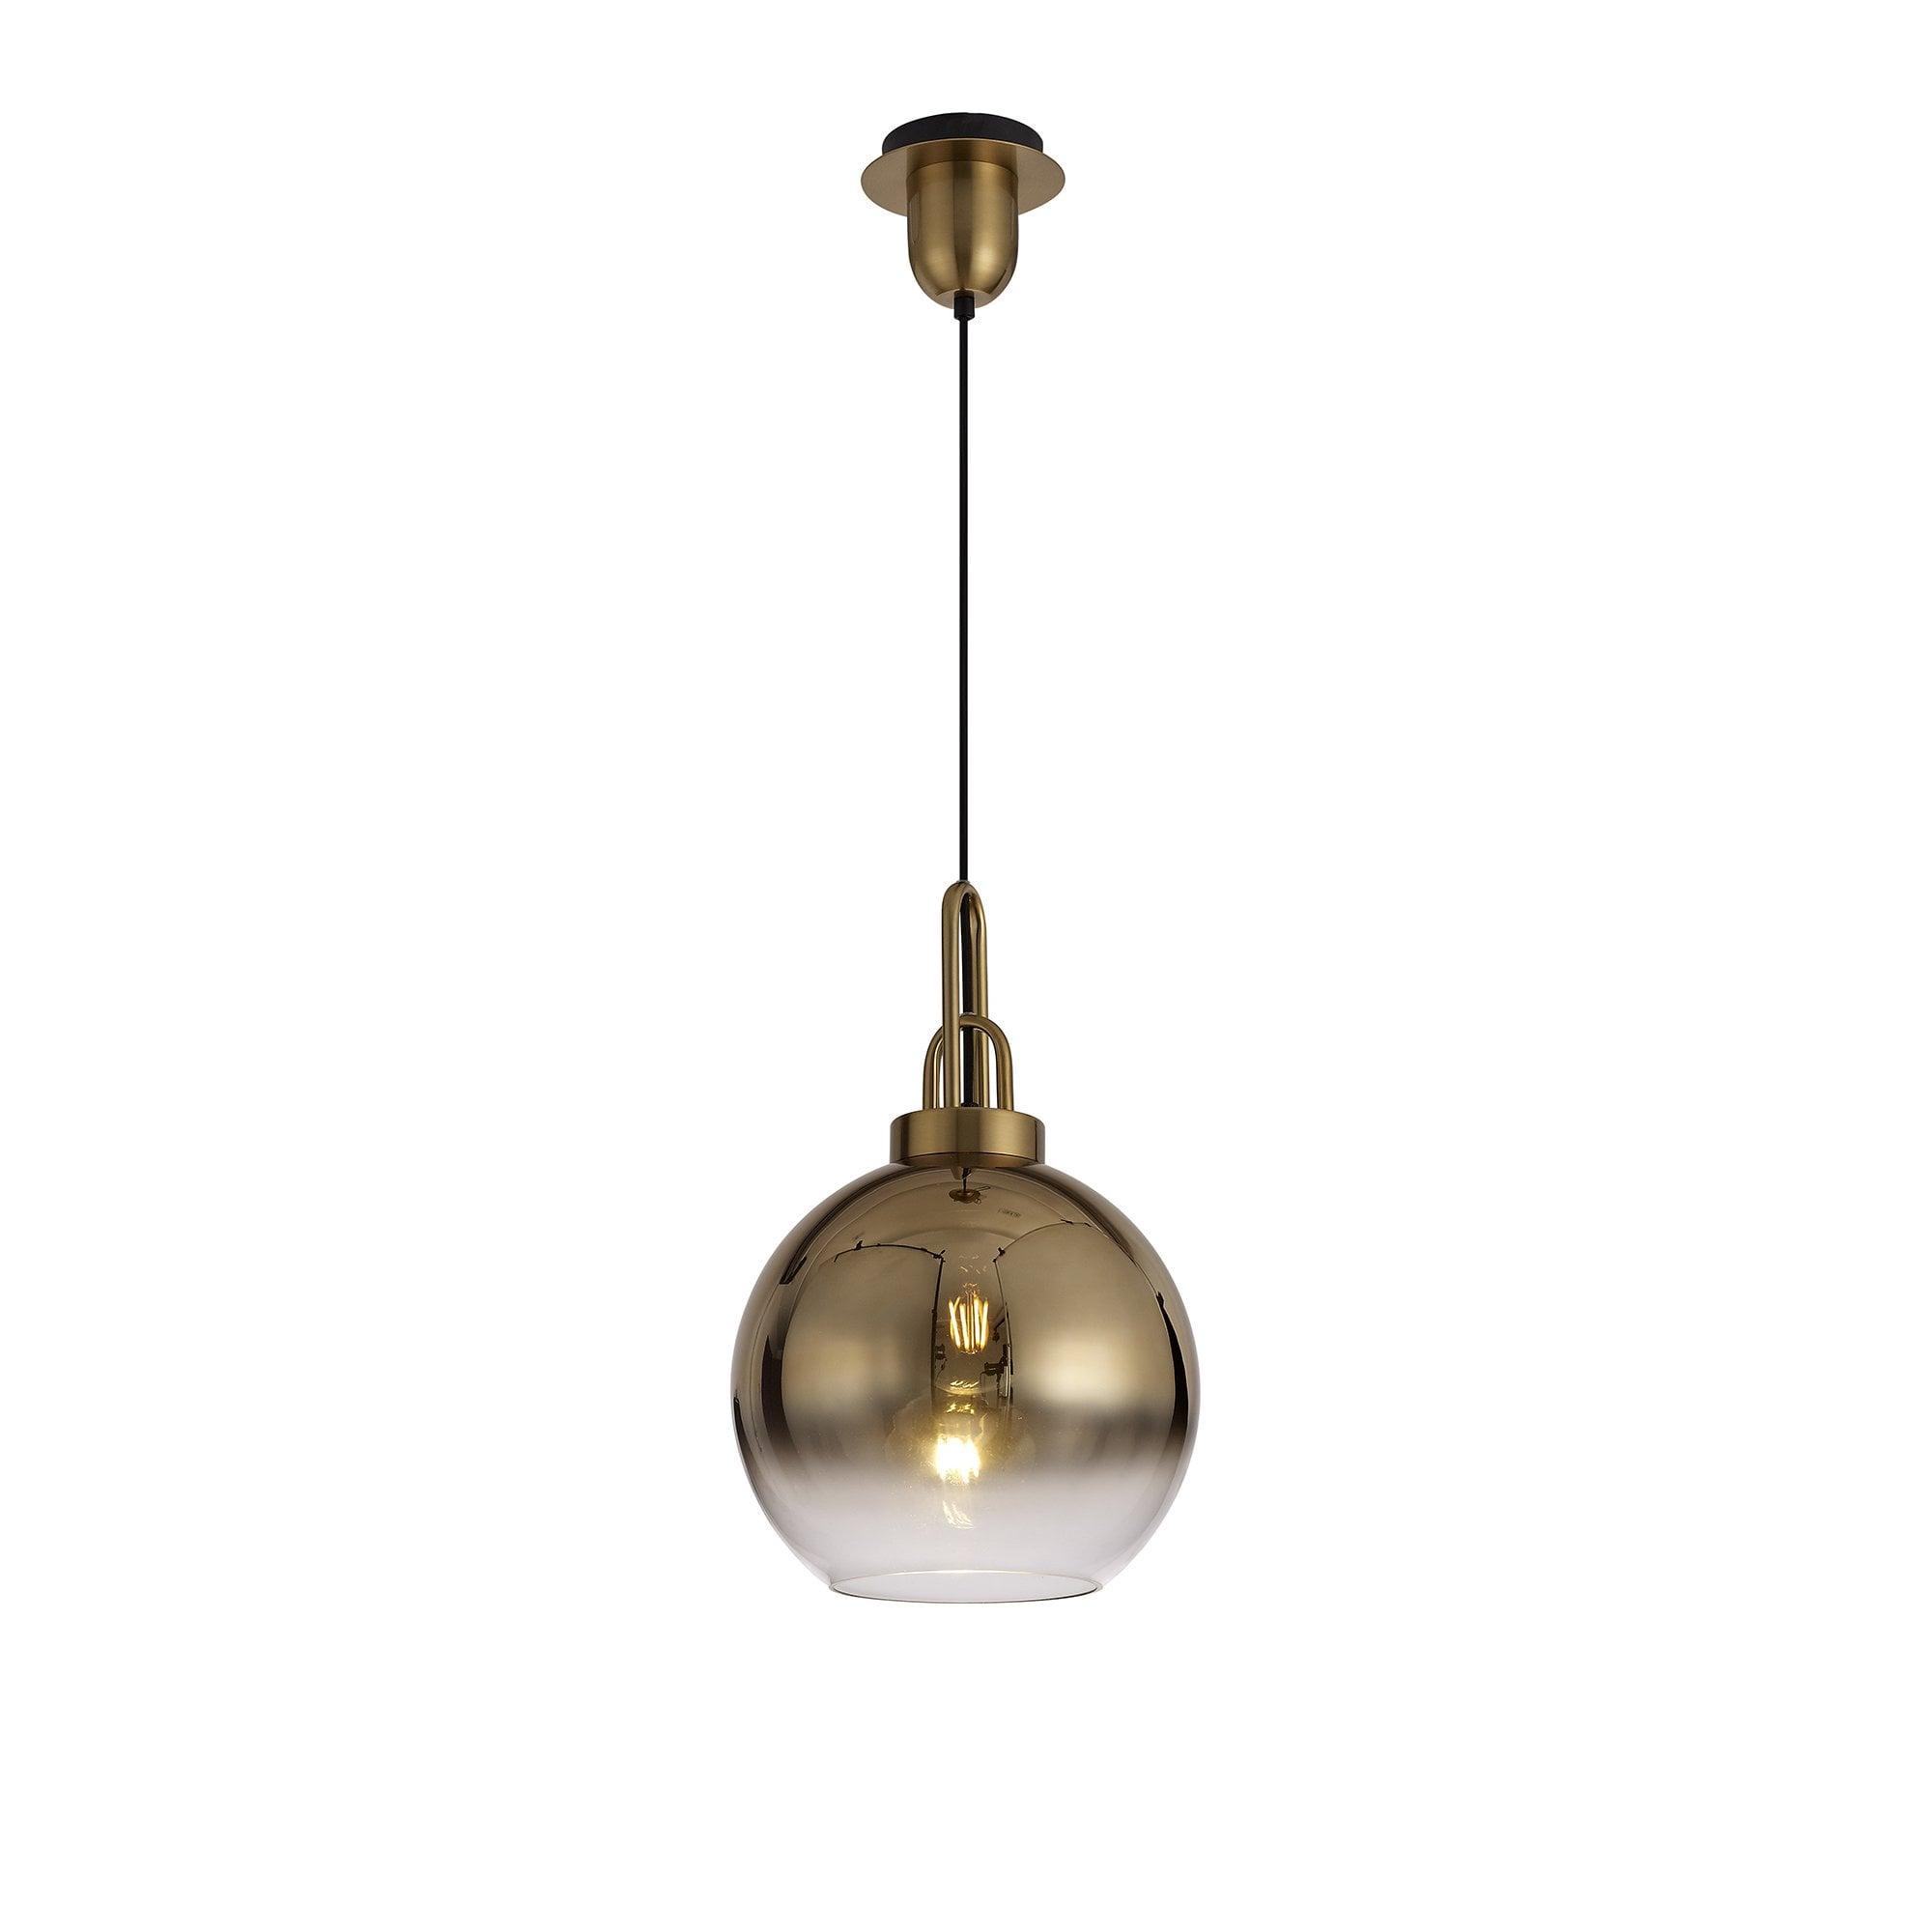 Ava Licht 1 Light Pendant E27 With 30cm Globe Glass Brass Gold Matt Black Clear Shop By Type From Ideas4lighting Uk